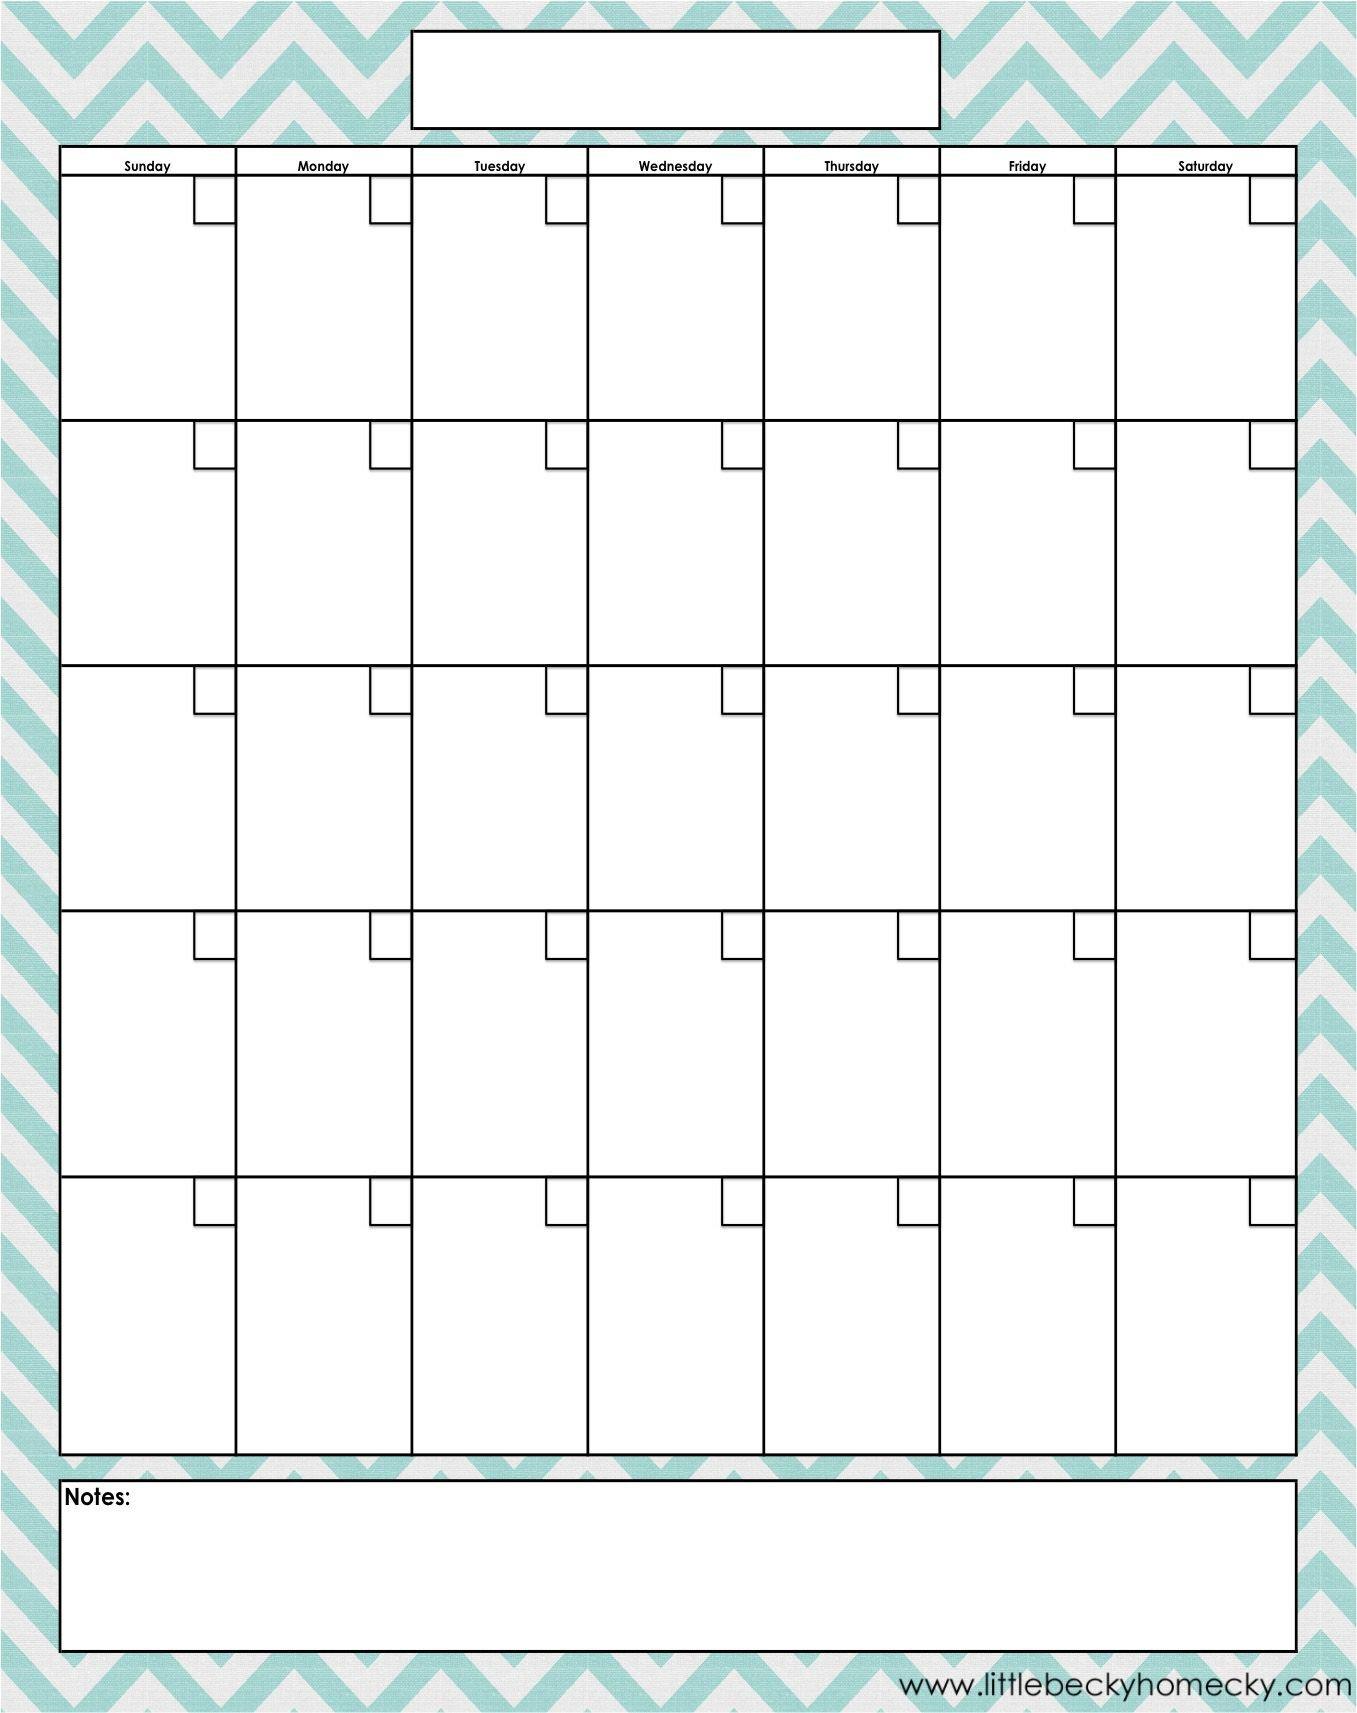 Monthly Calendar Pri̇nt Out | Calendar Templates Free Online Calendar To Fill In